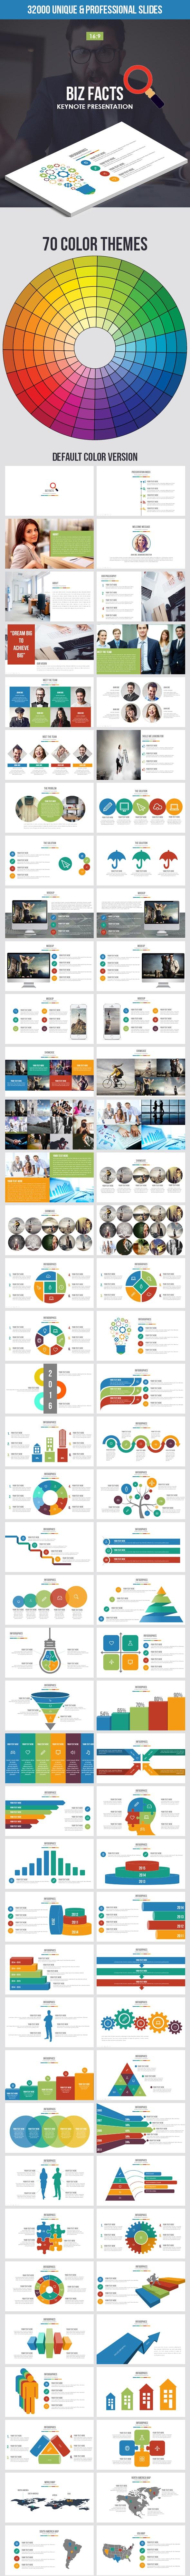 Biz Facts Keynote Template - Business Keynote Templates